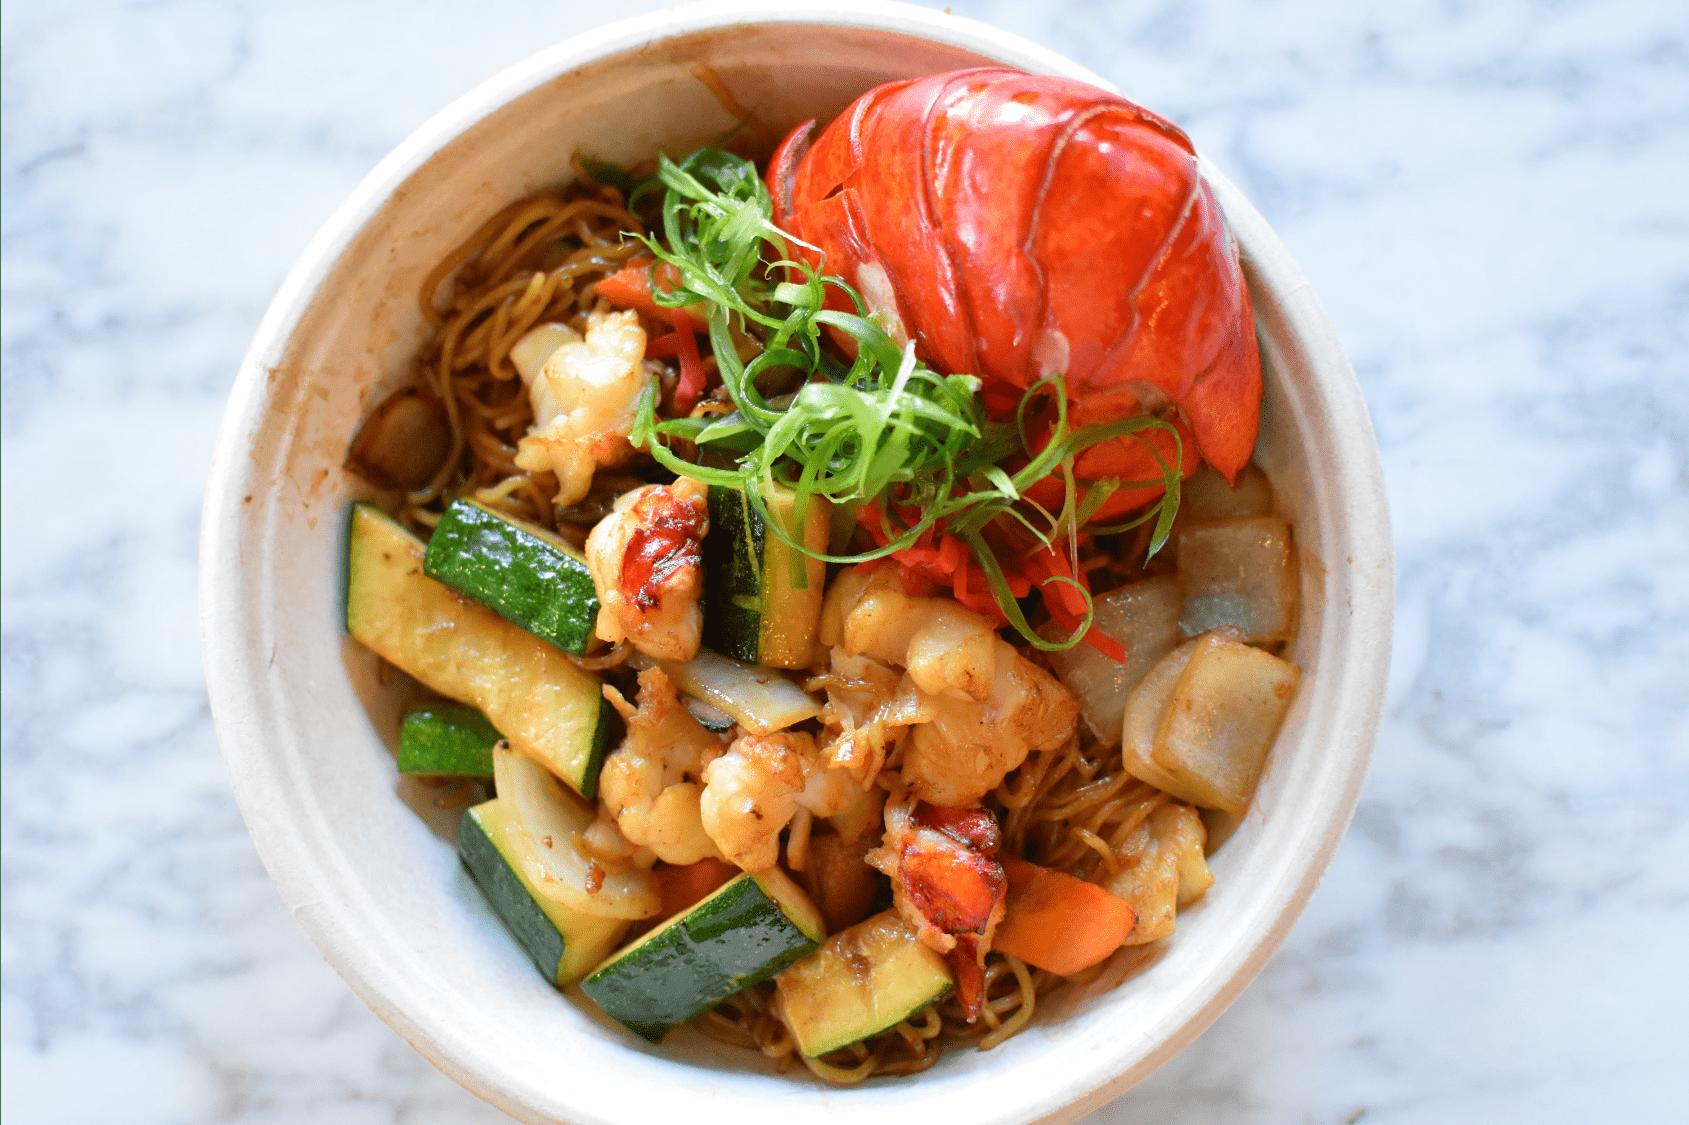 Opening Feb. 18: Chef Chin's Hibachi & Ramen